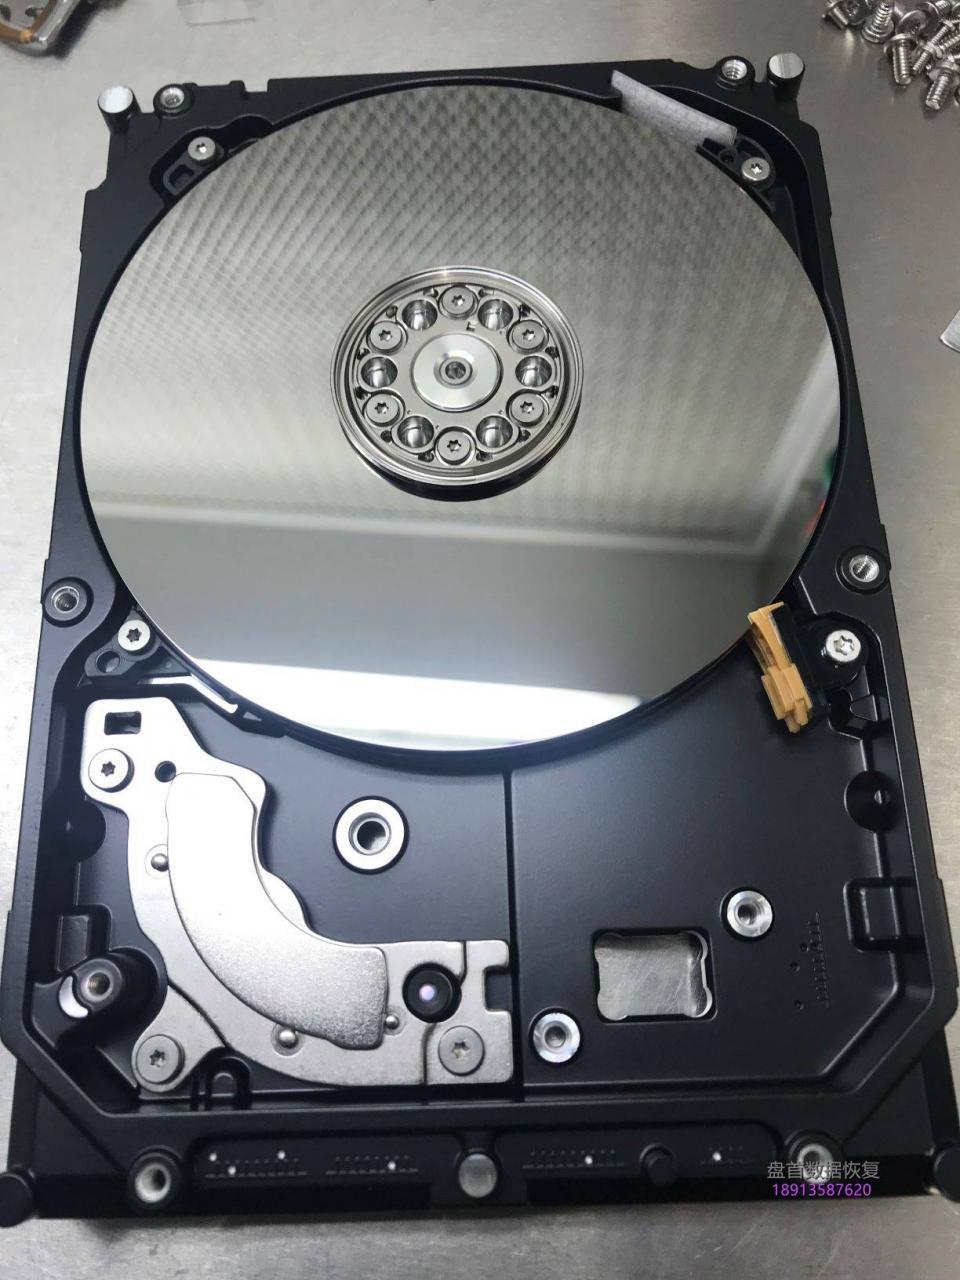 ST4000DM004通电异响敲盘几秒停转希捷台式机硬盘开盘数据恢复完美成功